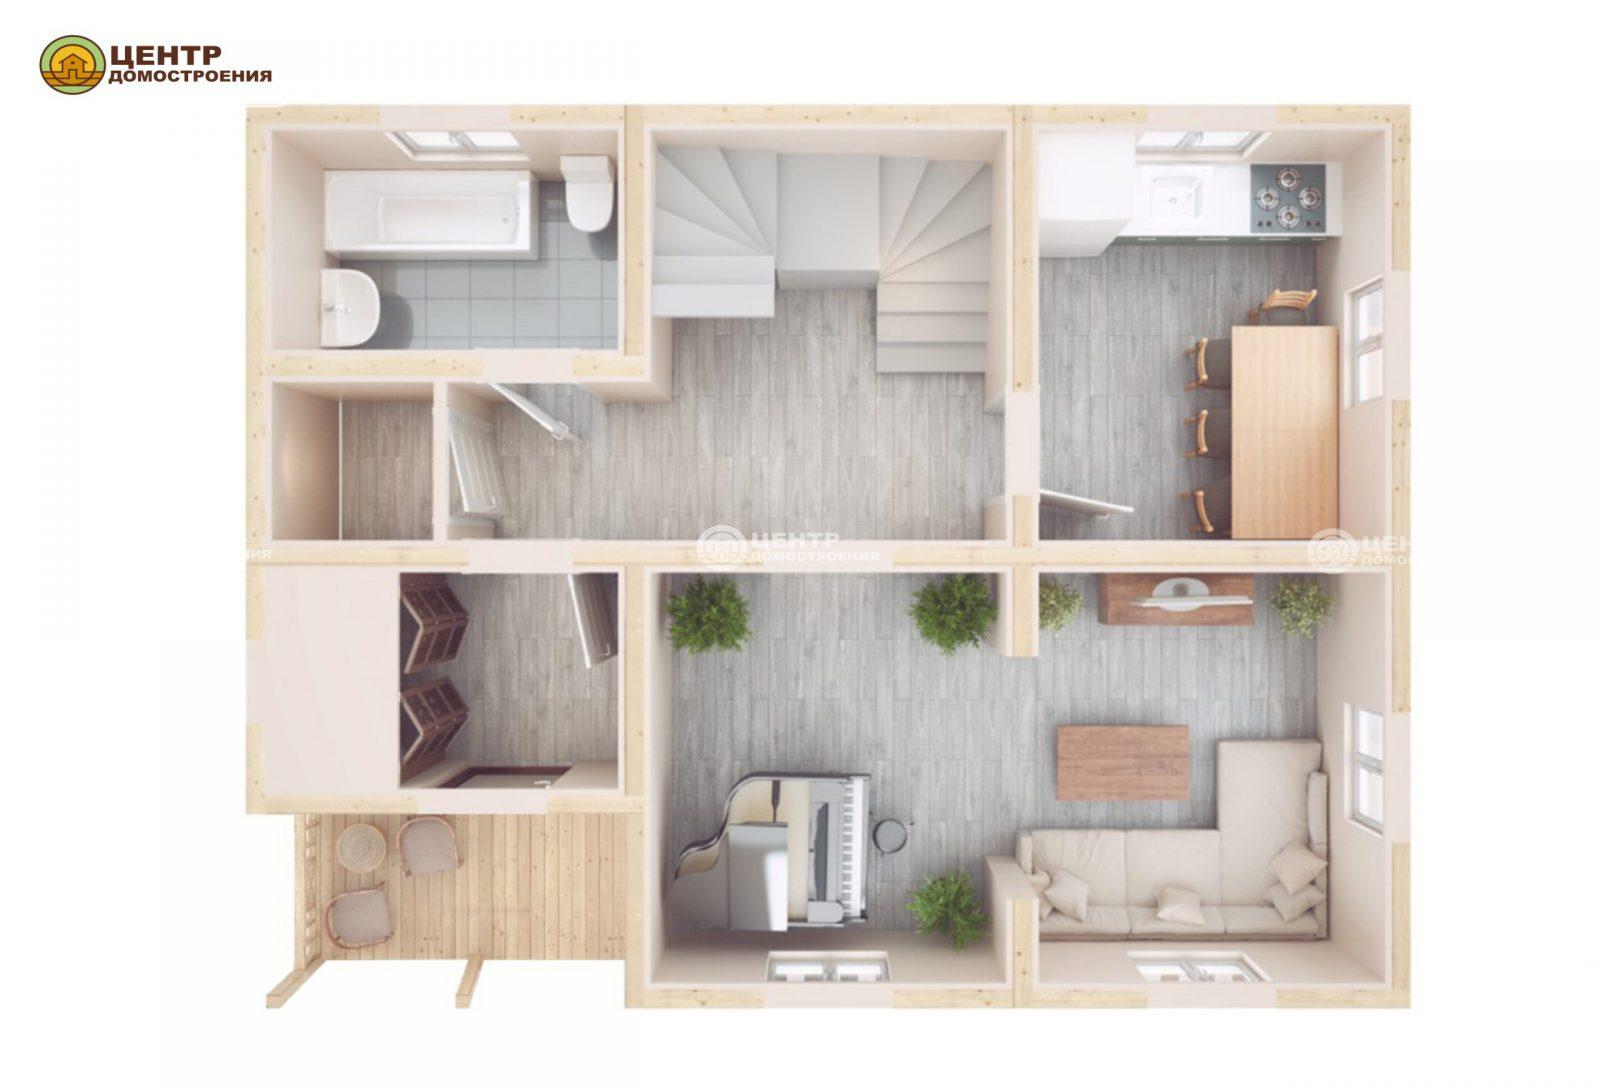 Проект дома 9 на 7 с мансардой